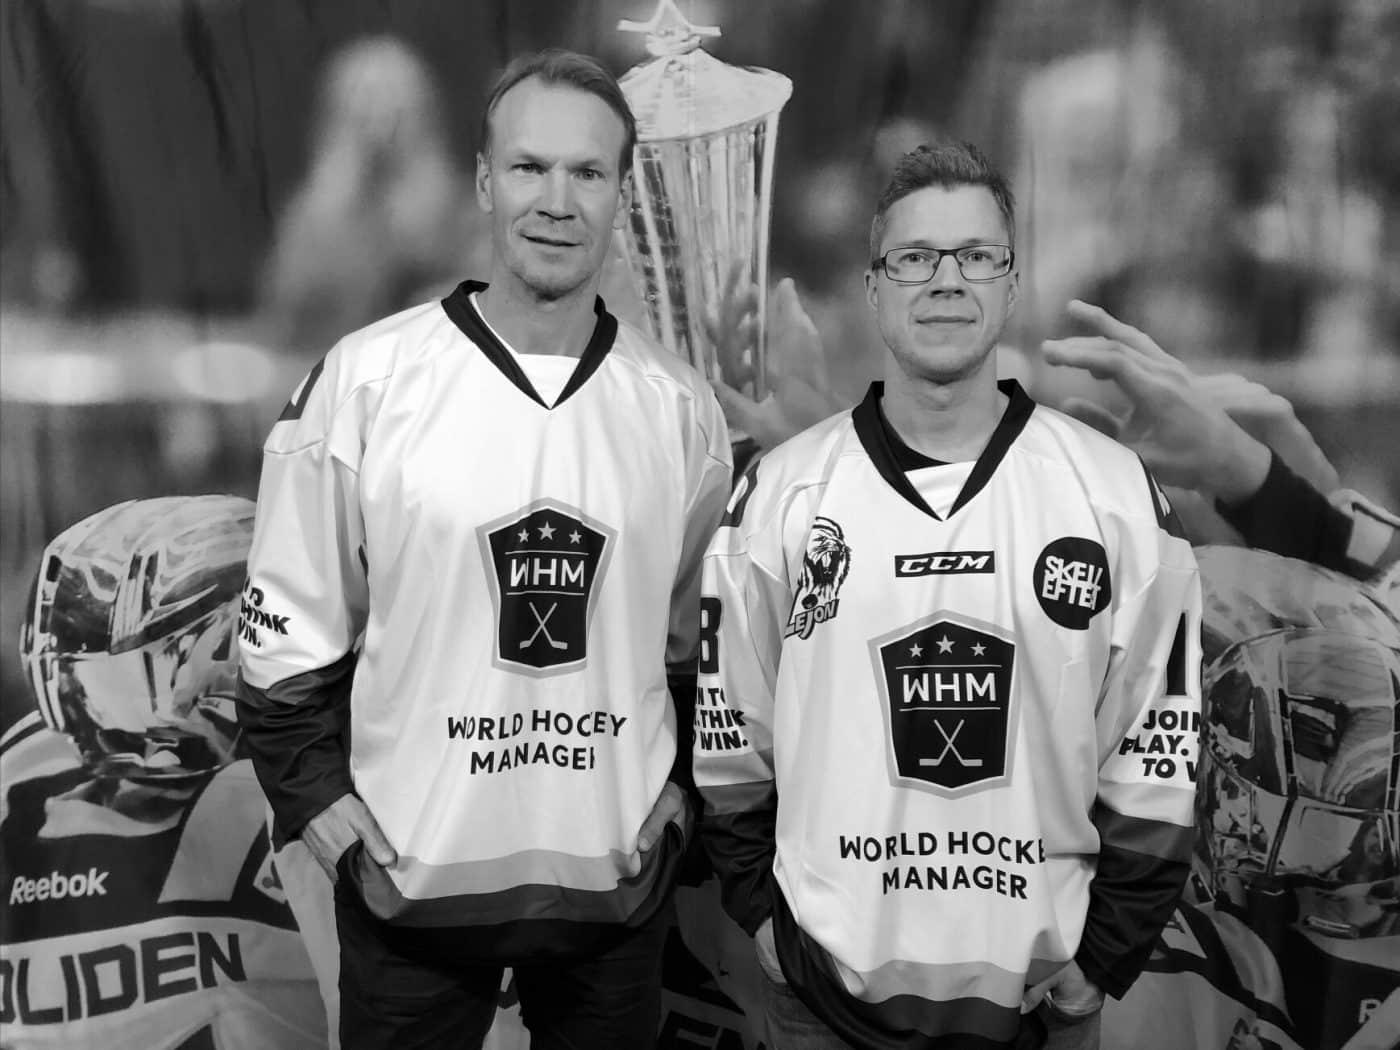 INTERVJU: Så aktiverade Gold Town Games sitt sponsorskap med SK Lejon